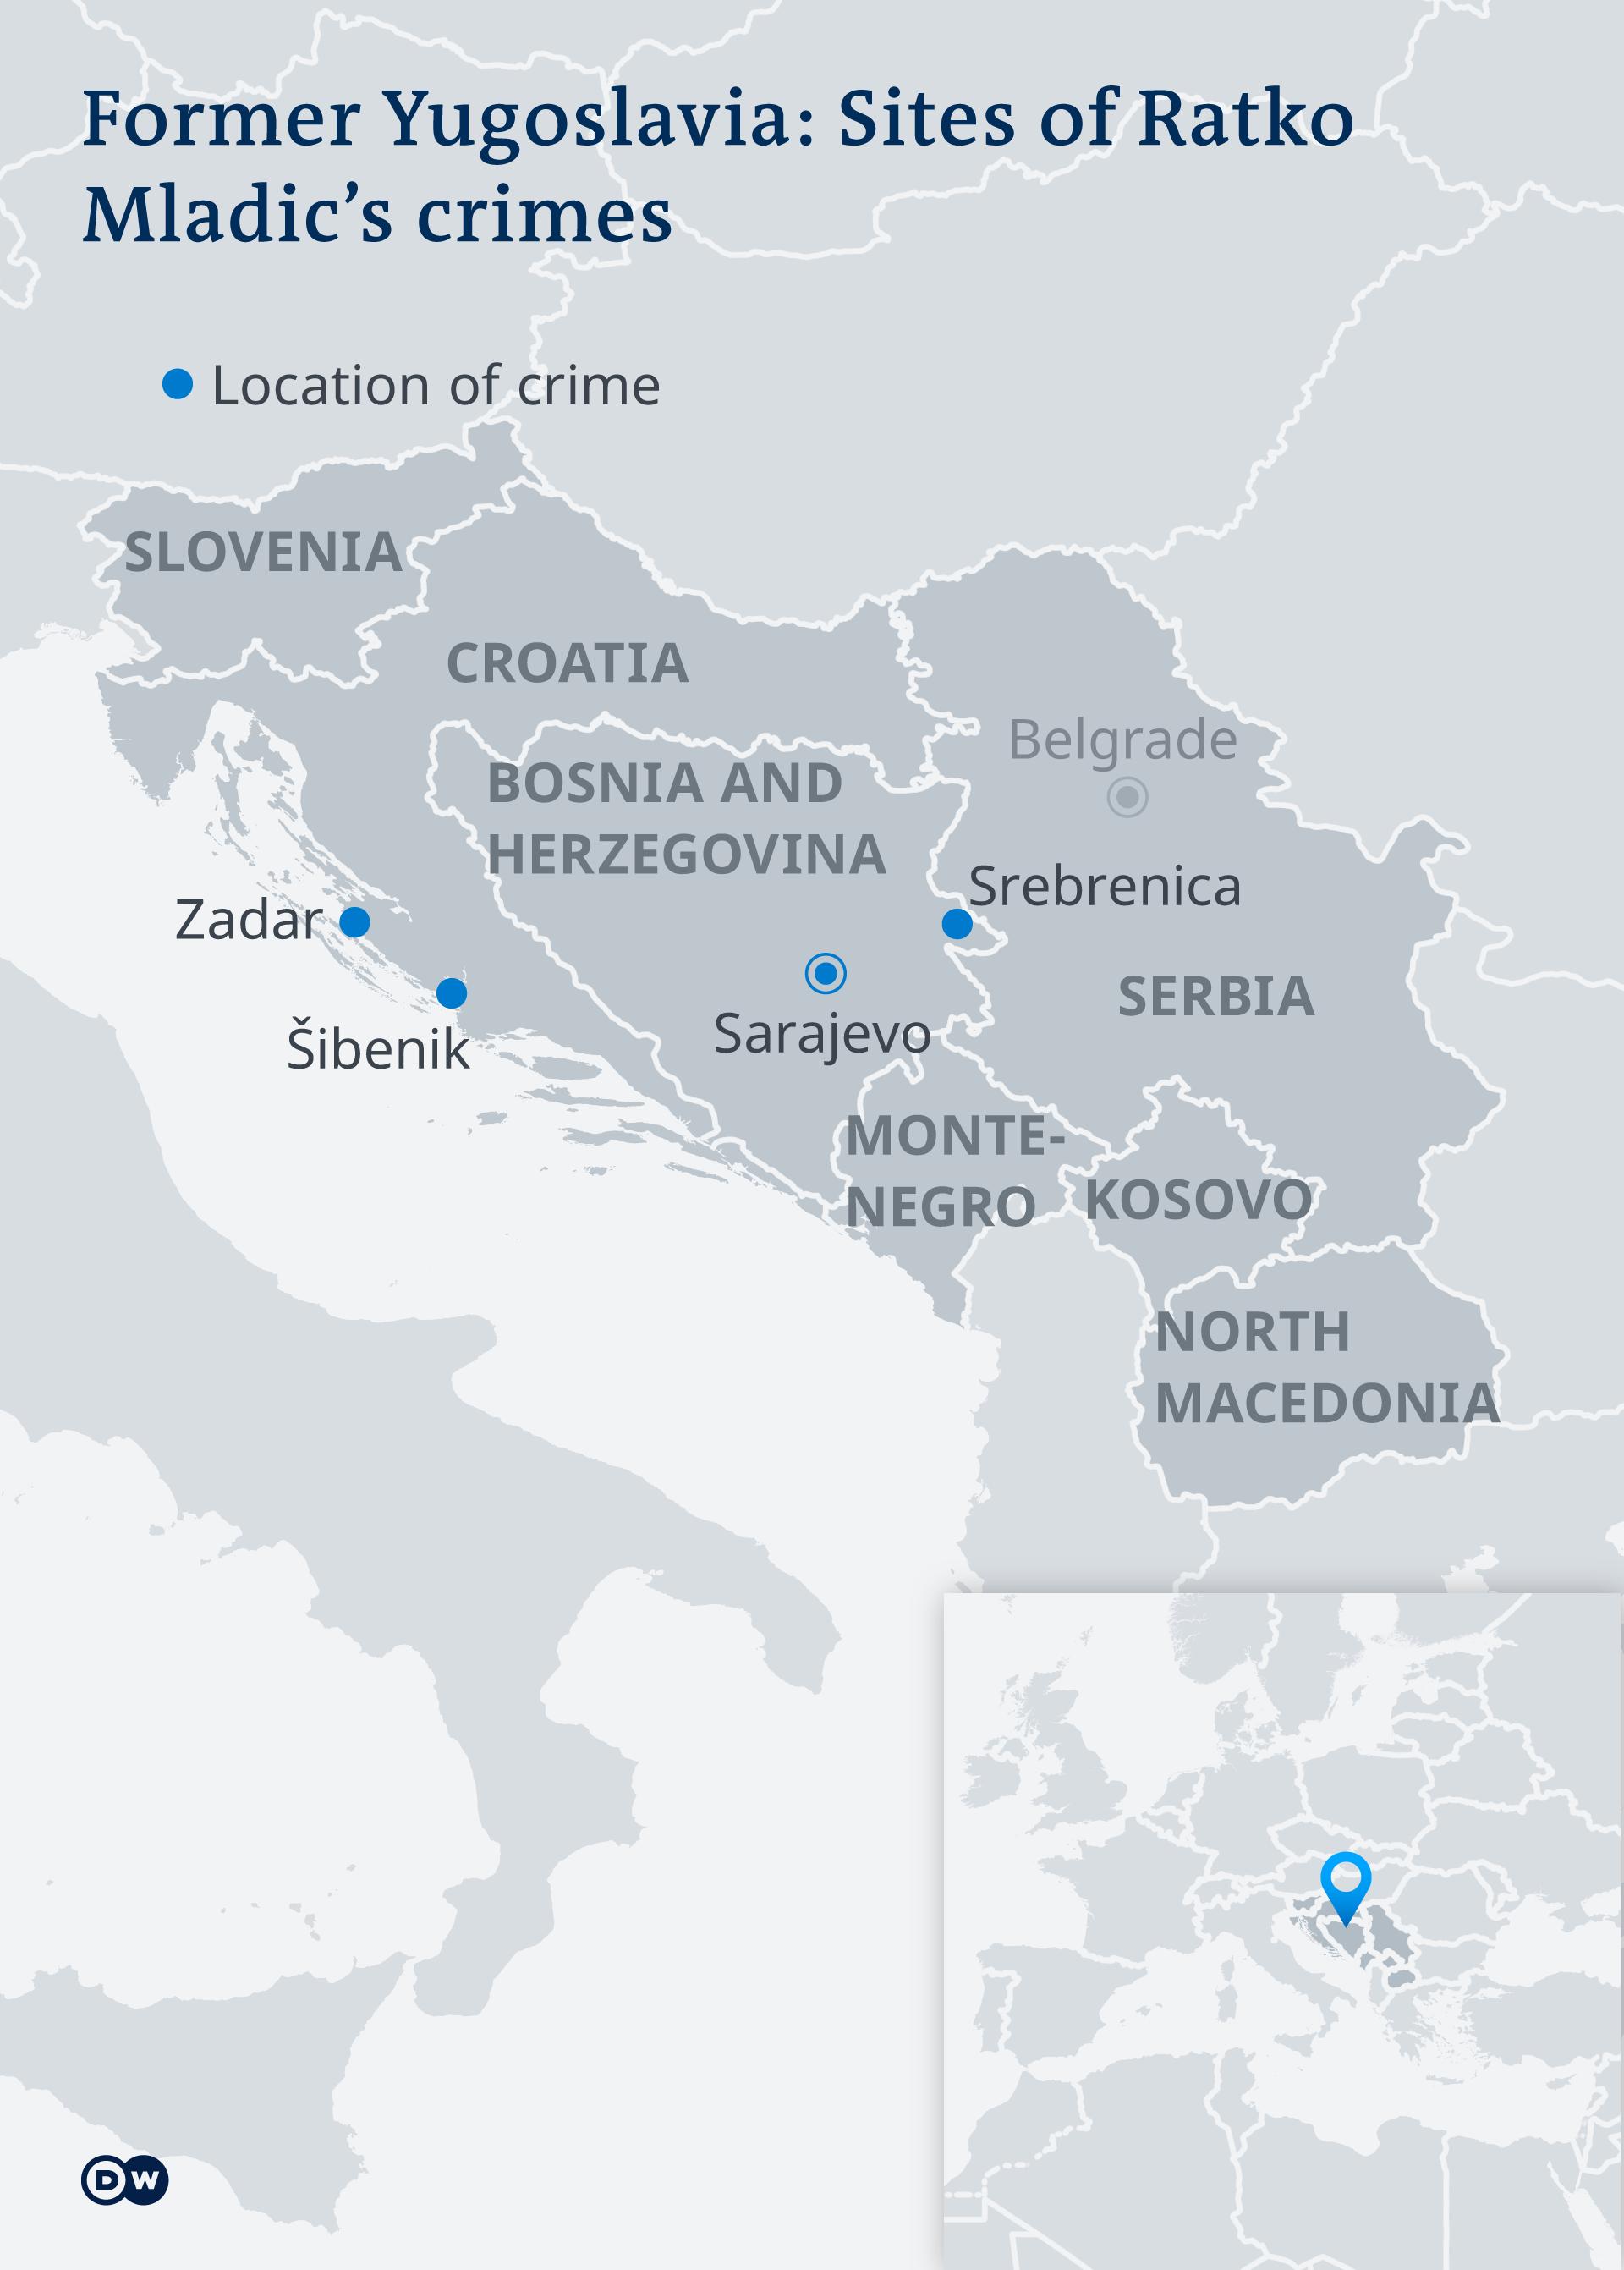 Map indicating locations of Mladic war crimes